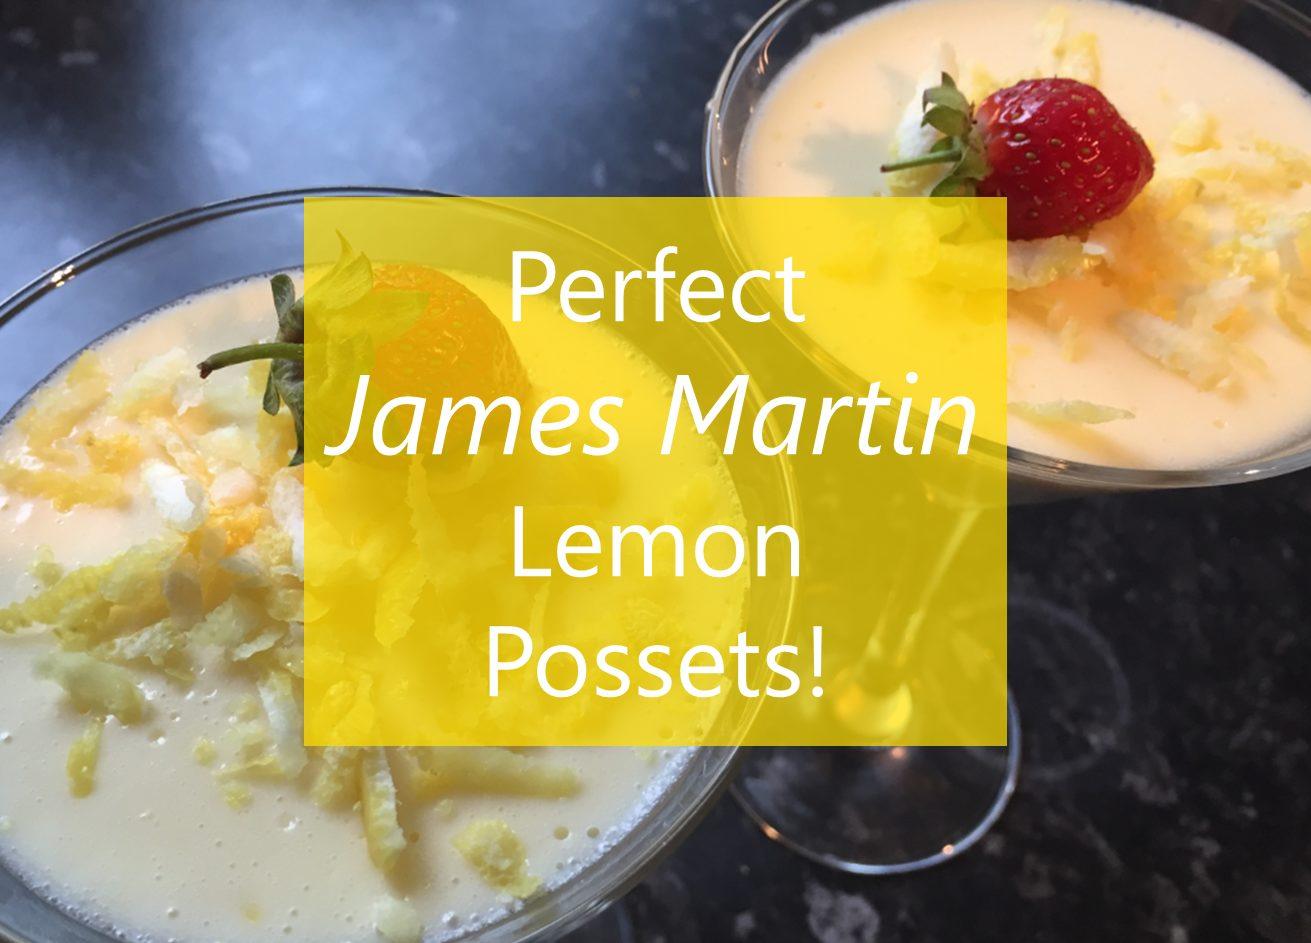 perfect james martin asda lemon possetts